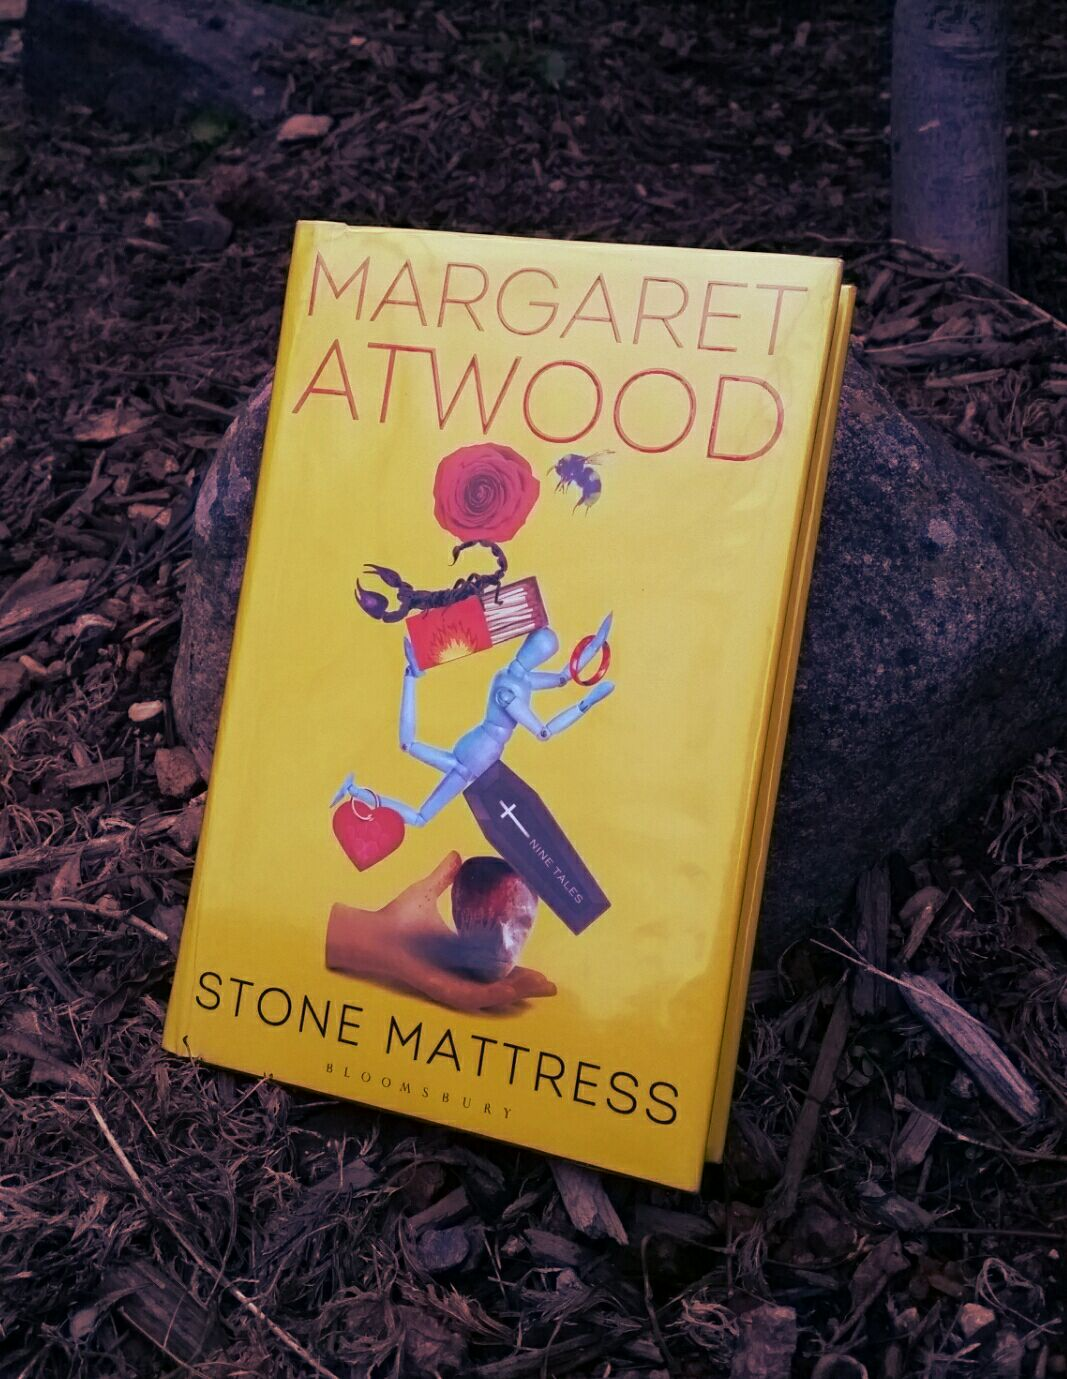 stone mattress by margaret atwood pdf